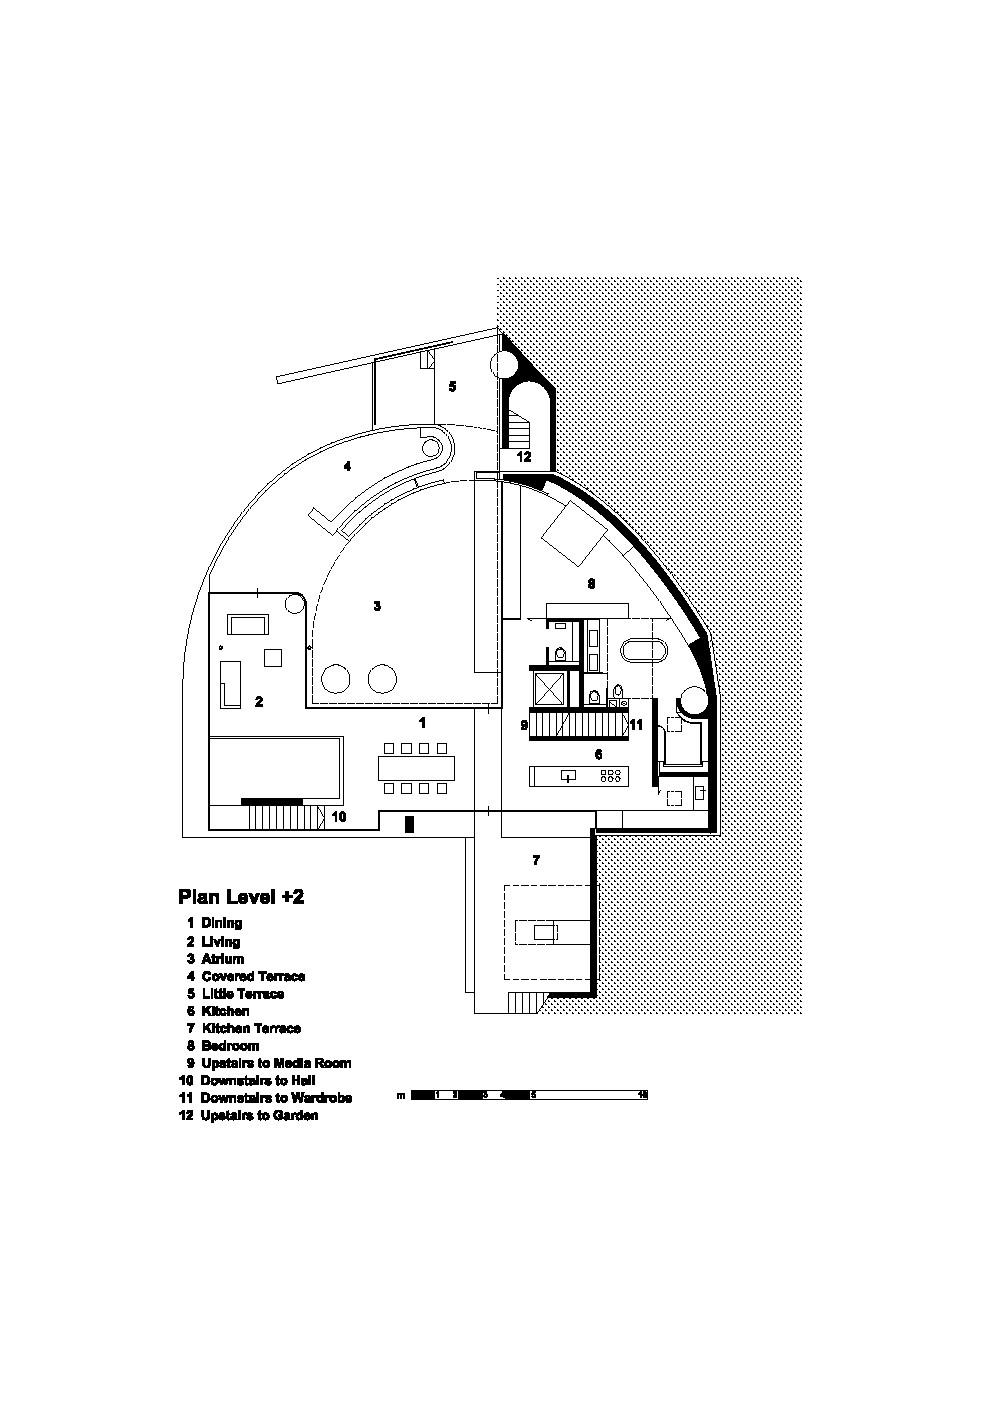 Exceptional House D / Pauhof Architekten. Plan